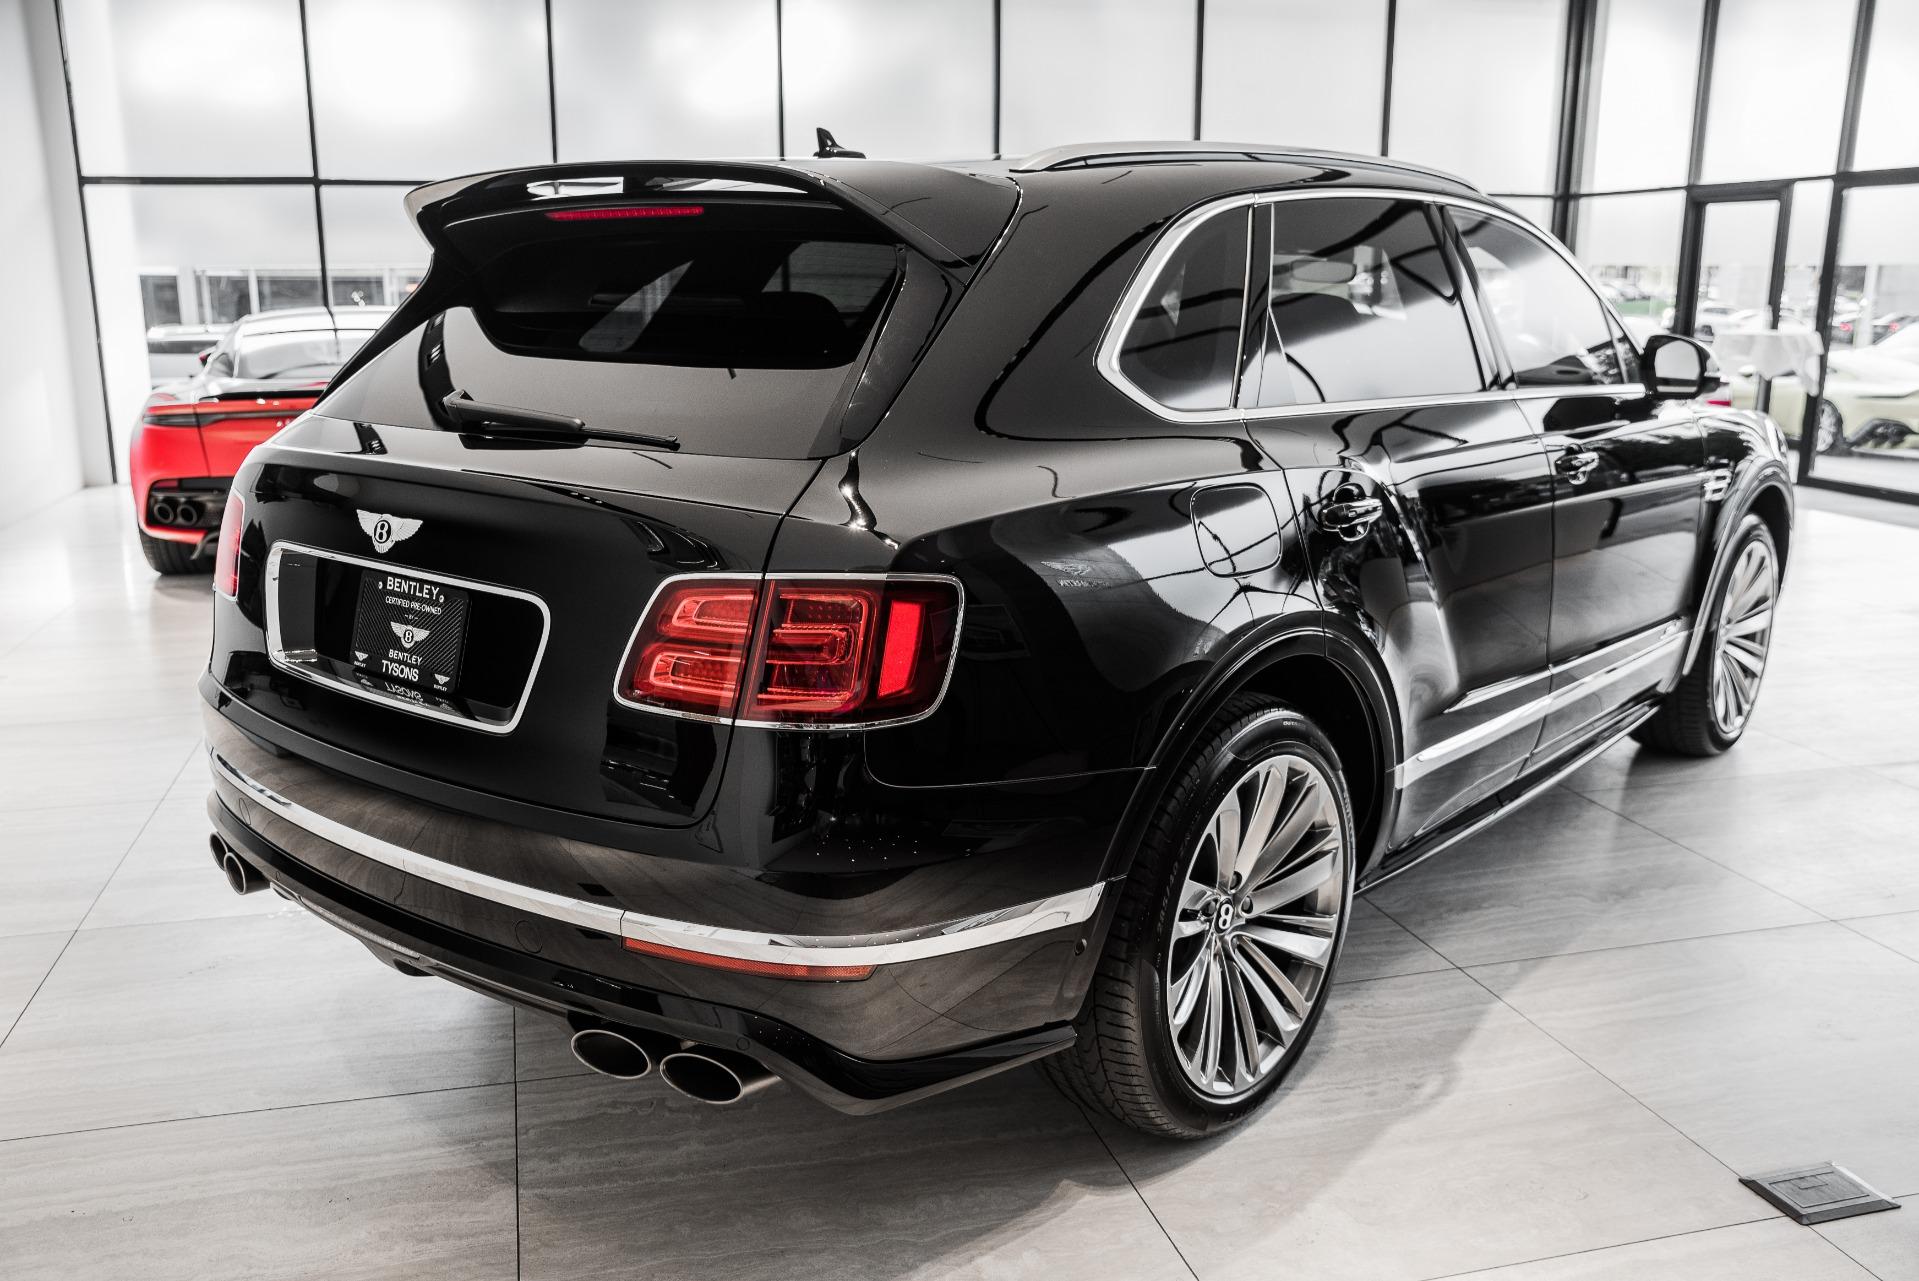 New-2020-Bentley-Bentayga-Speed